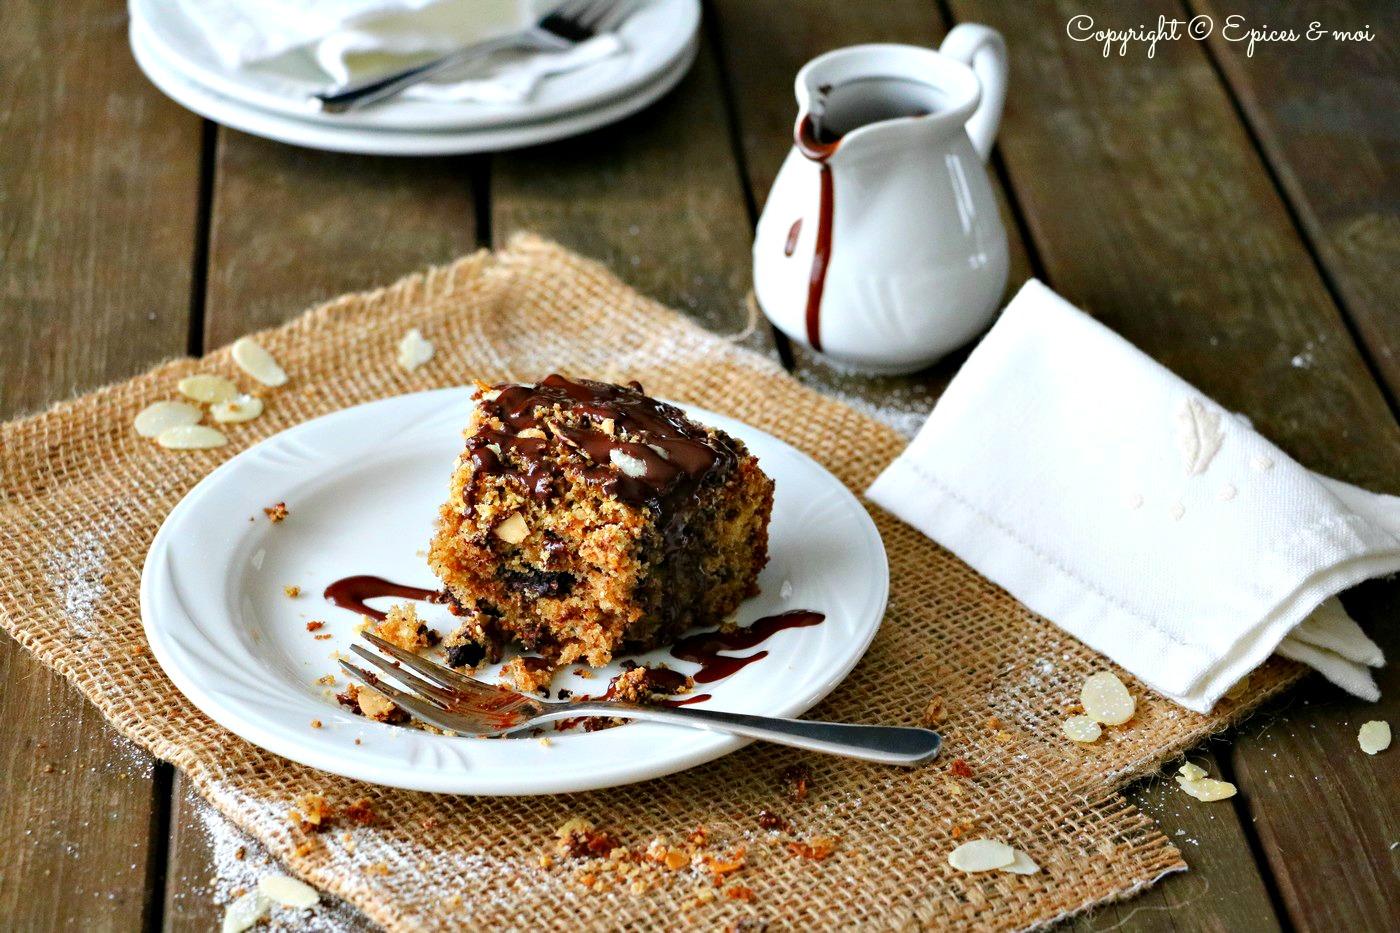 Epices & moi Gâteau choco amandes 6